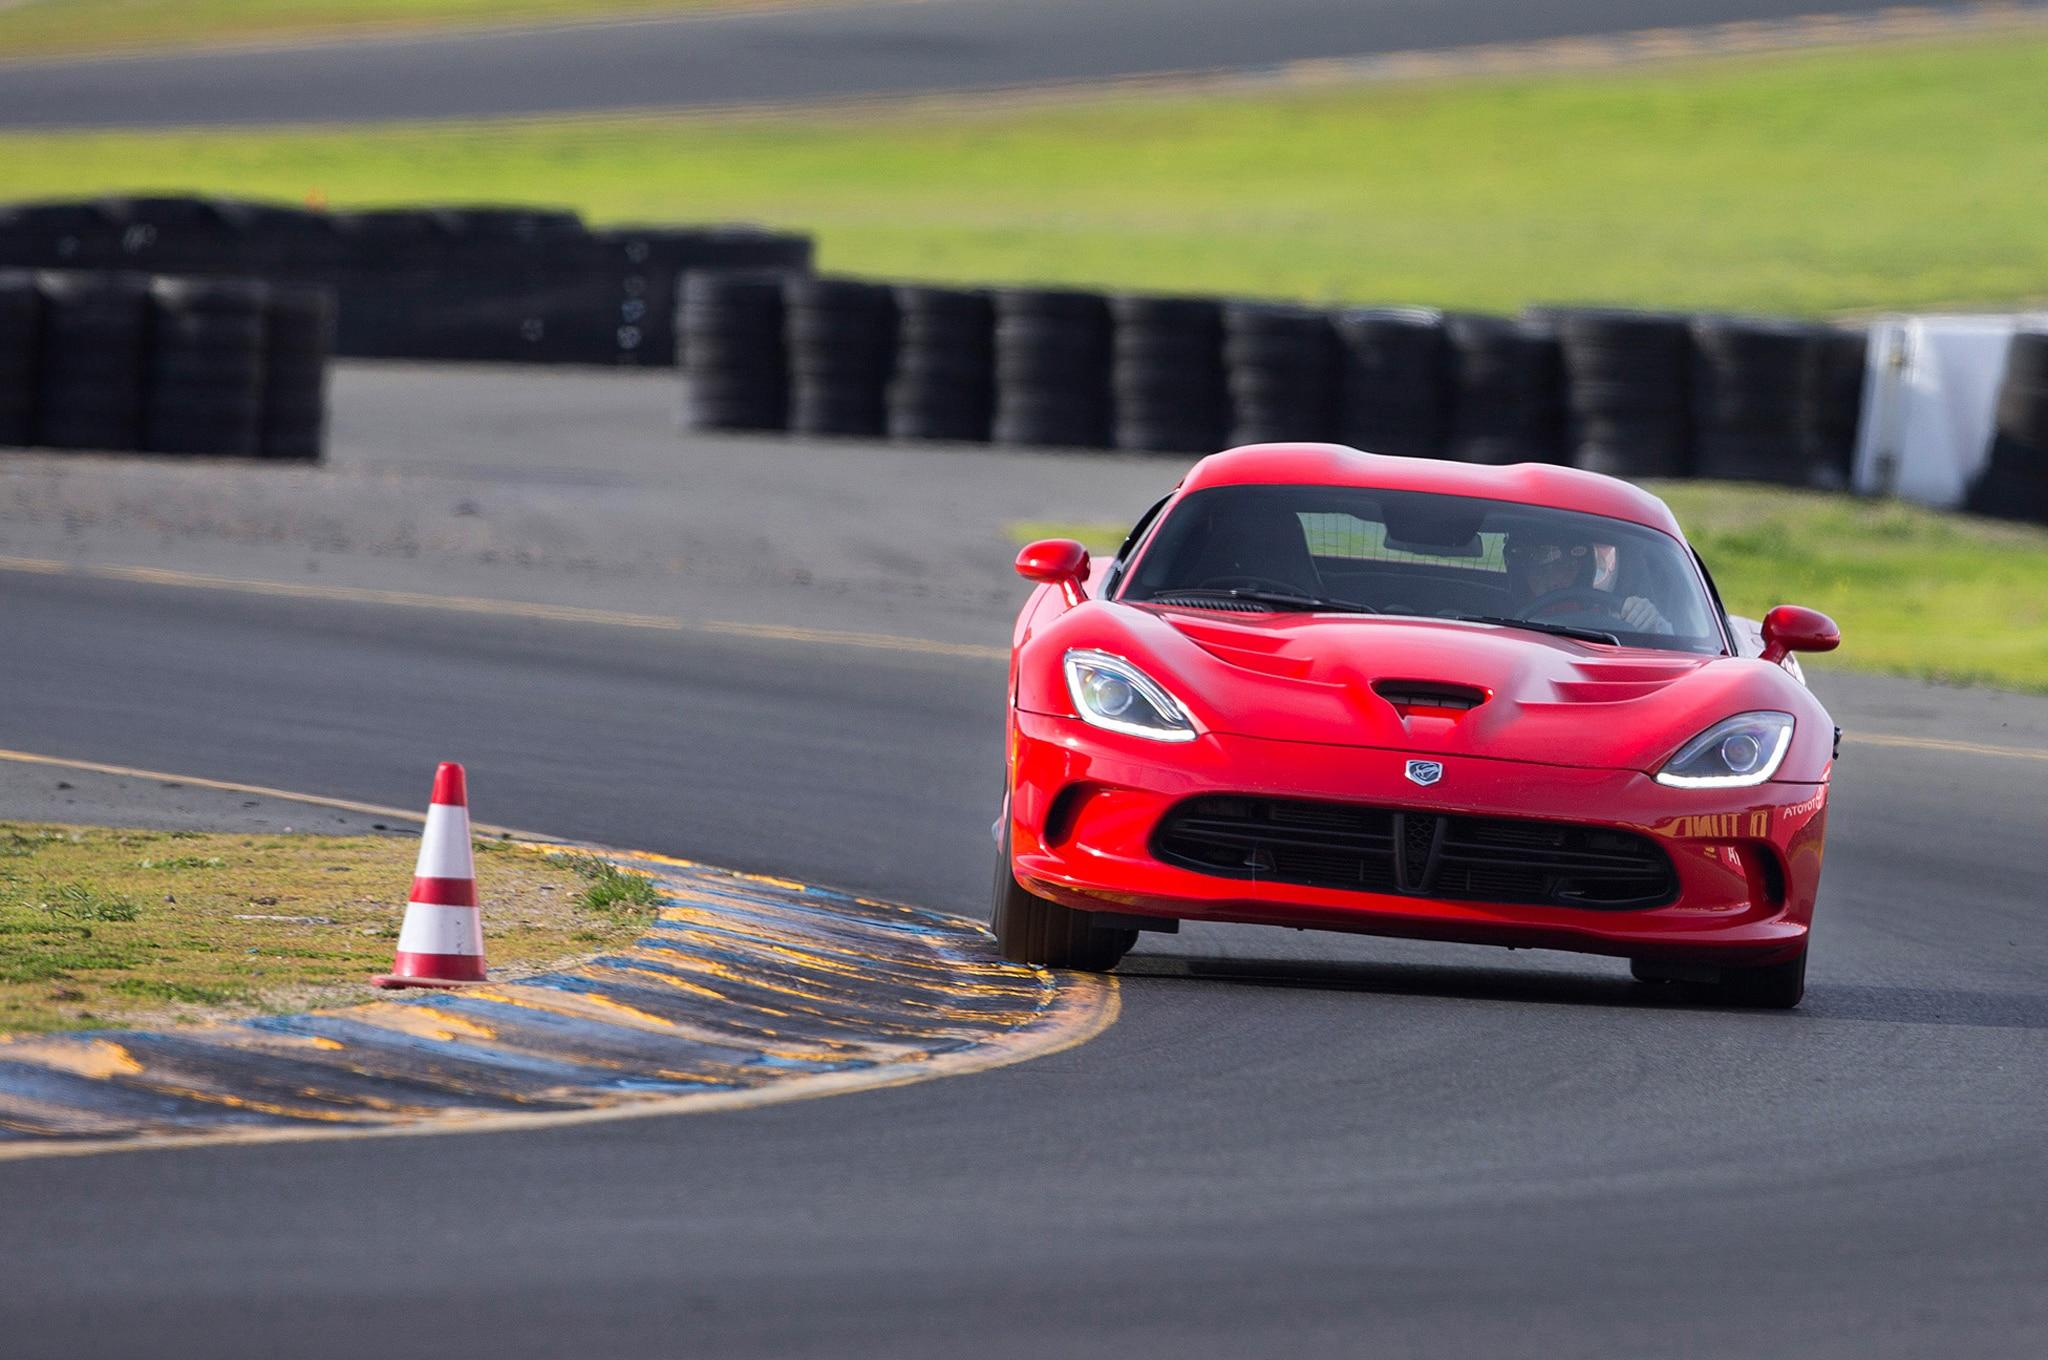 2013 SRT Viper On Track Front